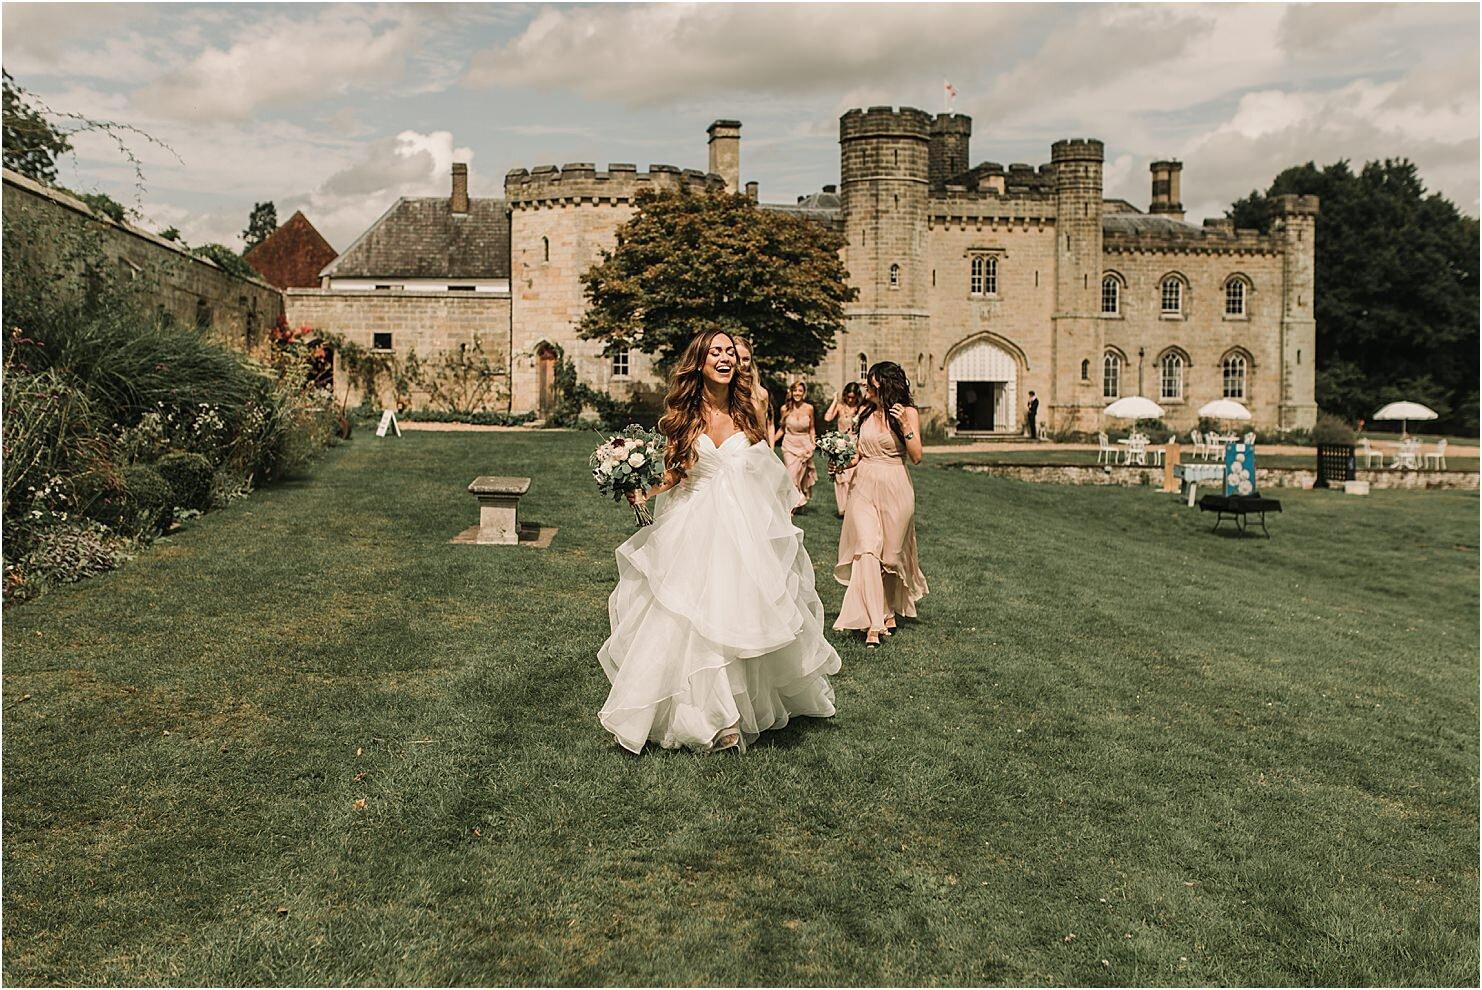 boda-de-cuento-en-castillo-boda-en-londres-43.jpg